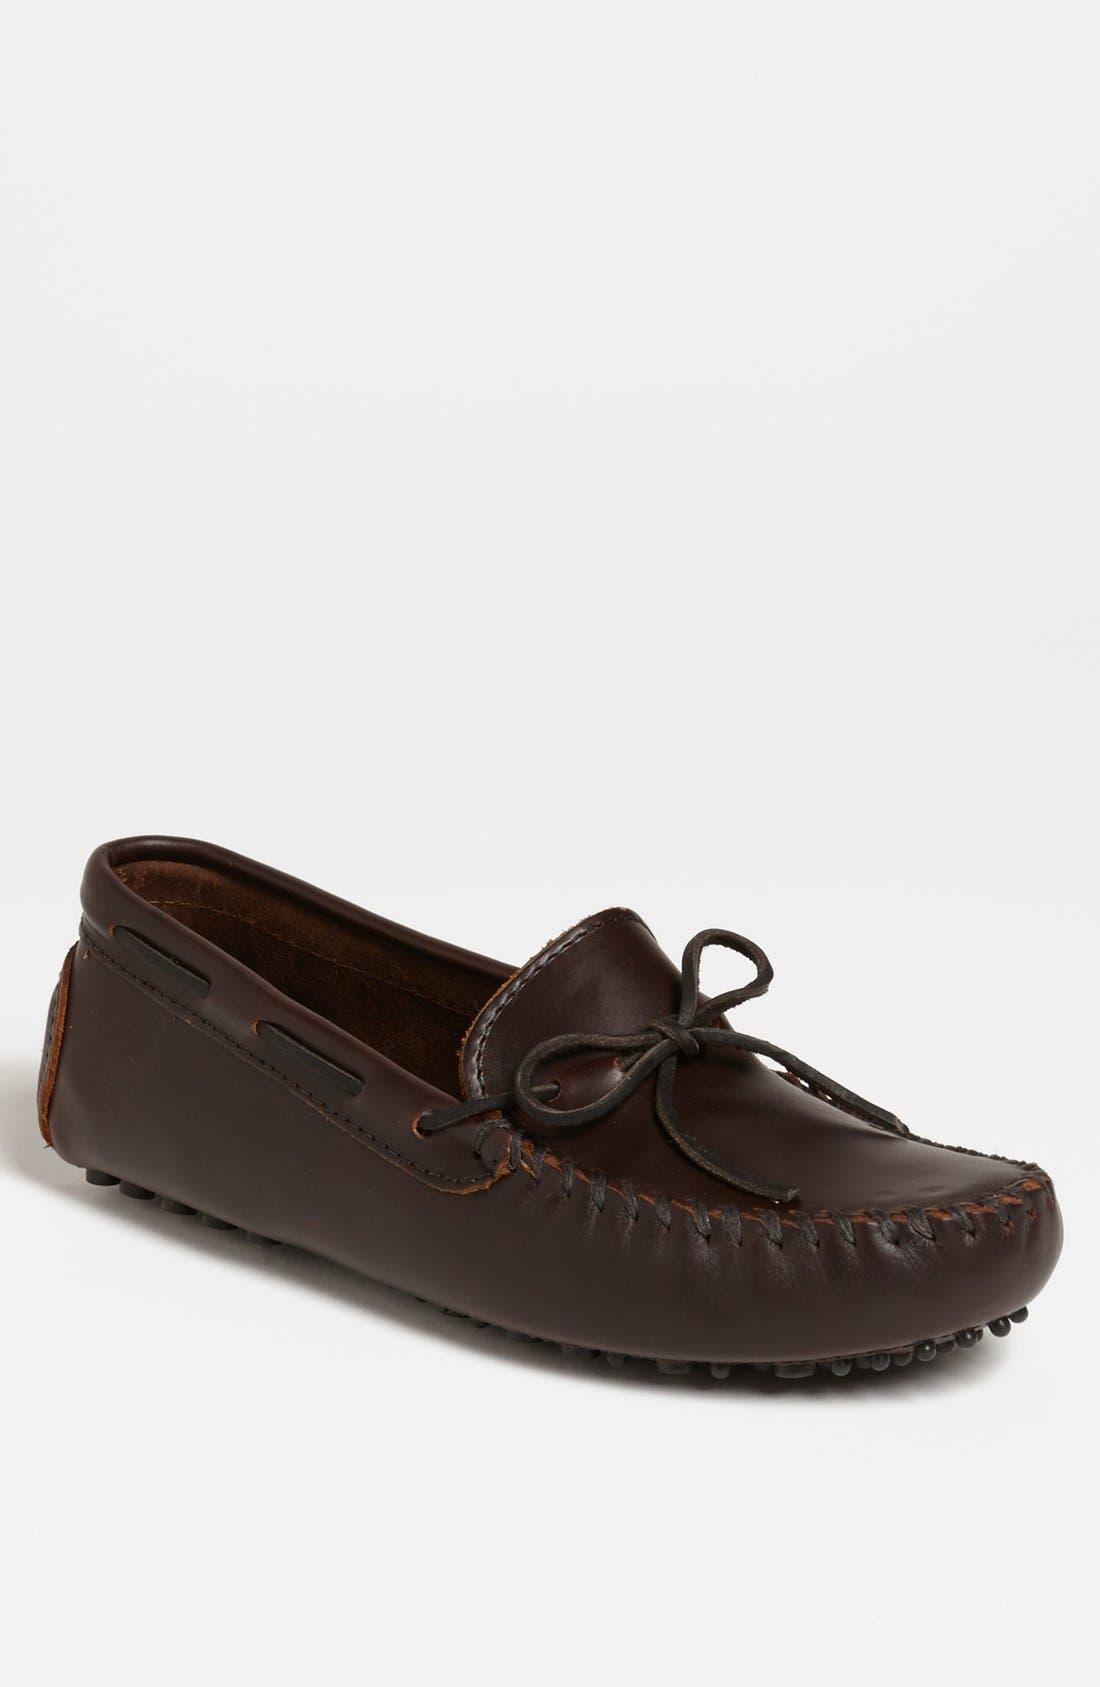 MINNETONKA Leather Driving Shoe, Main, color, DARK BROWN LARIAT